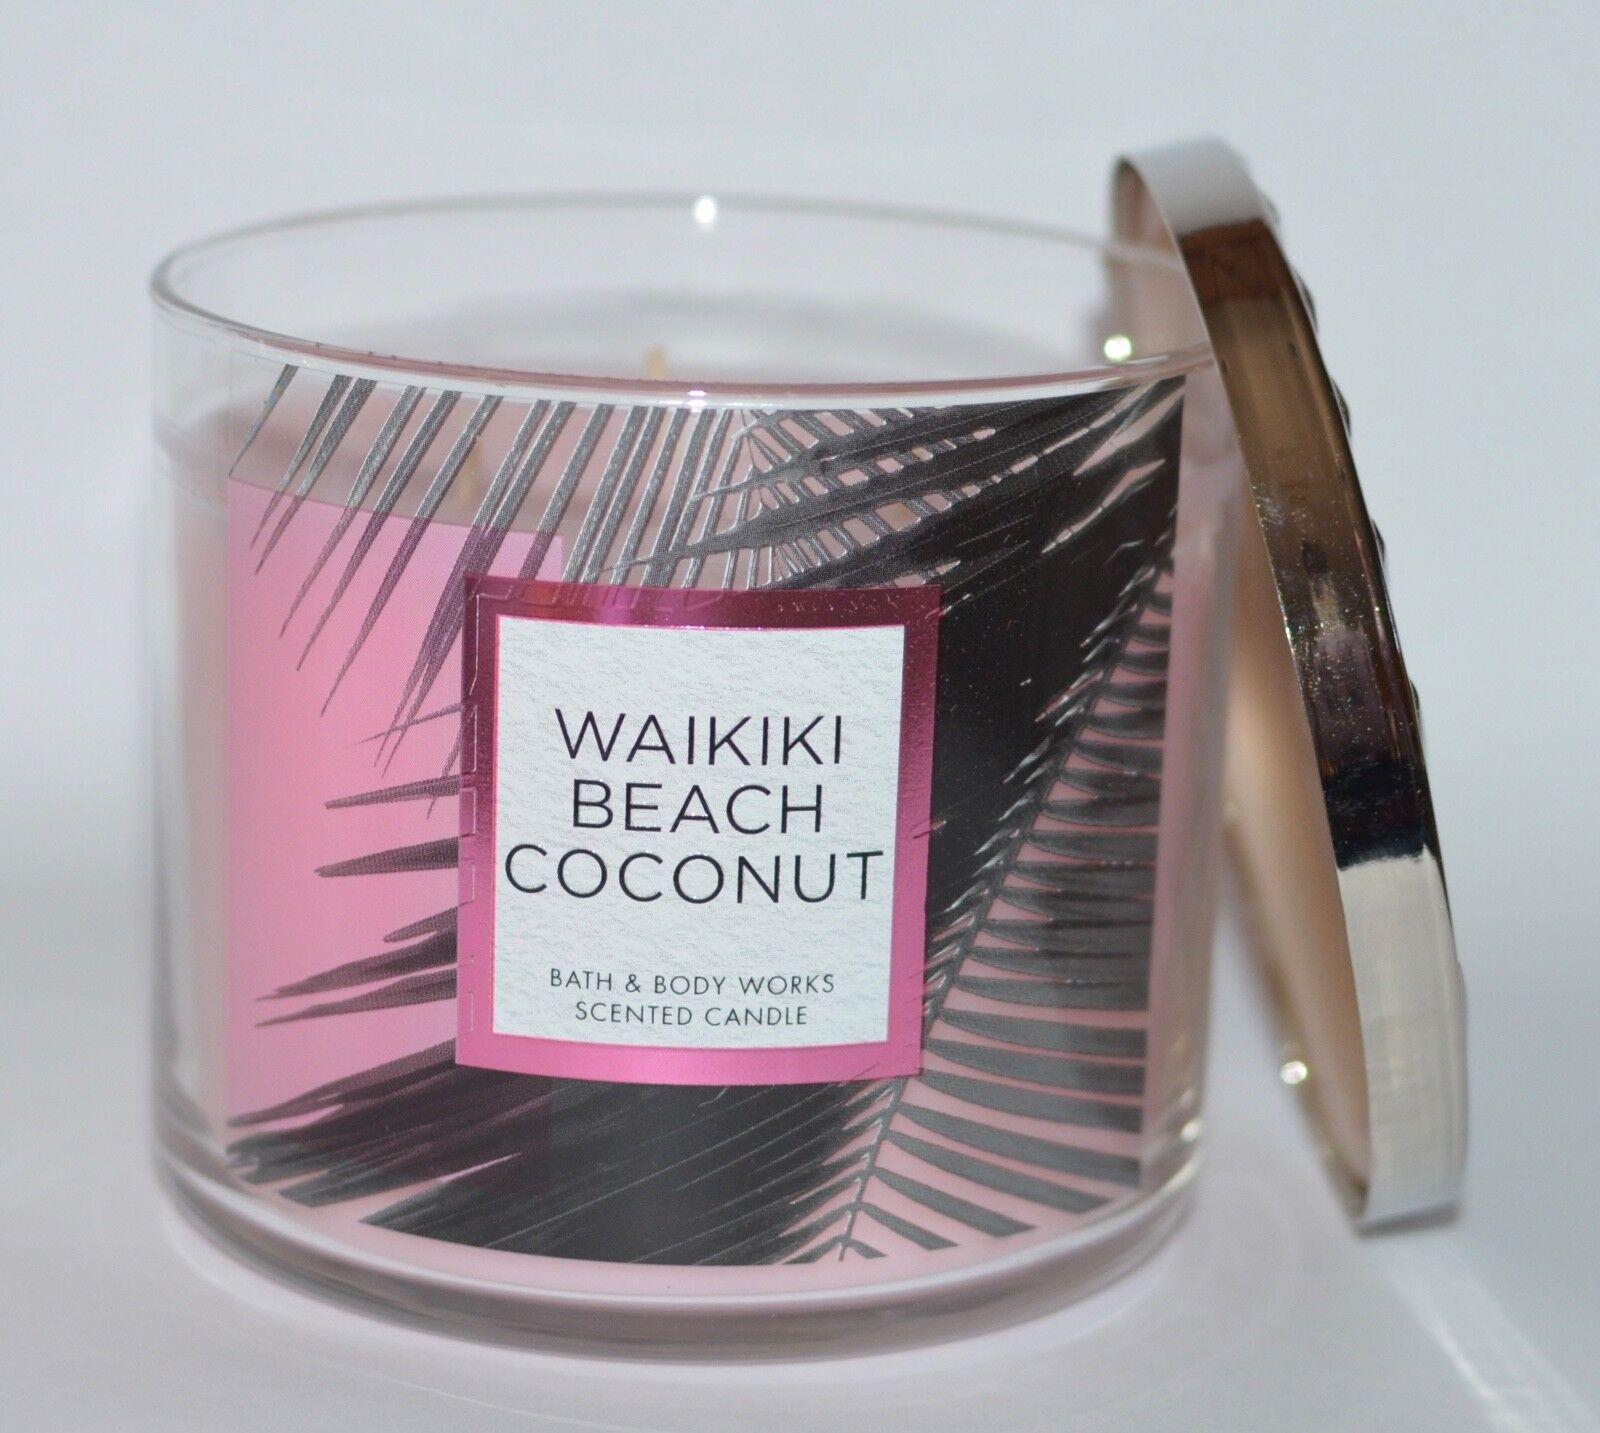 Bath Body Works Waikiki Beach Coconut Large Three Wick Jar Candle